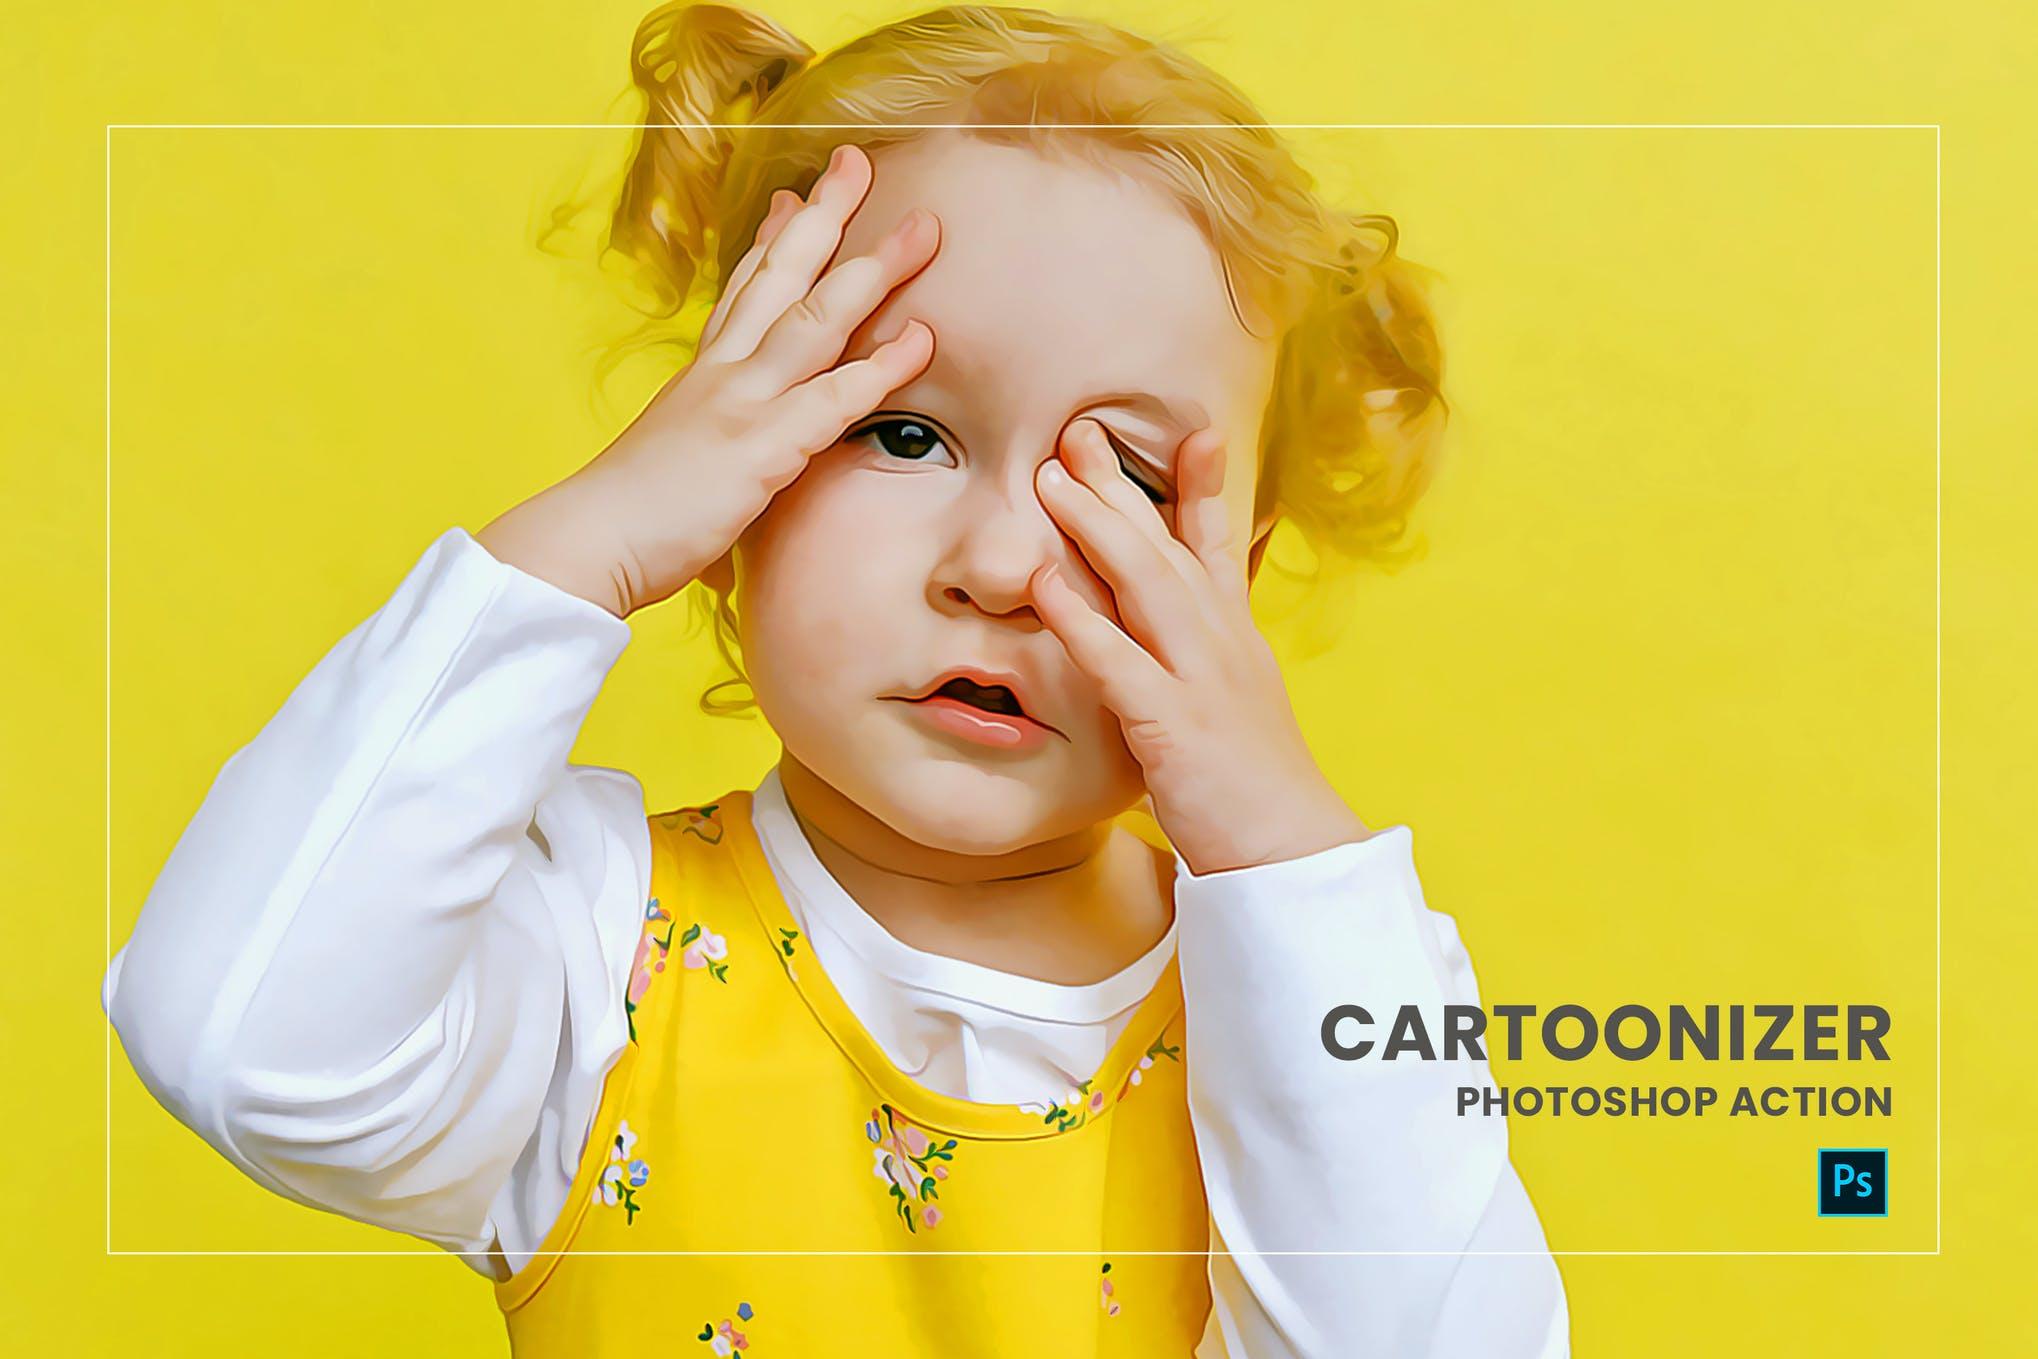 cartoon effects photoshop